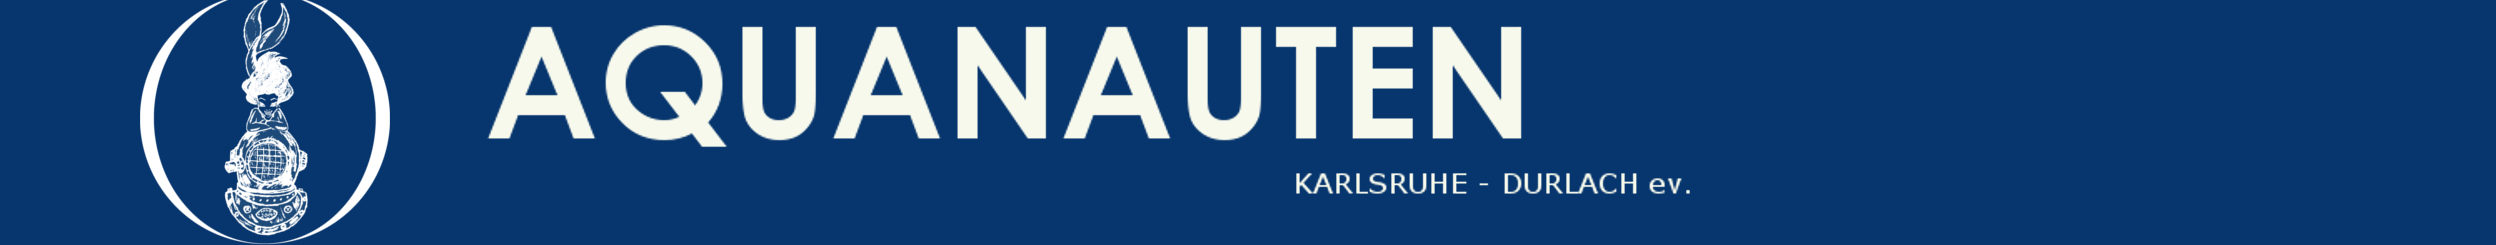 Aquanauten Karlsruhe-Durlach ev.